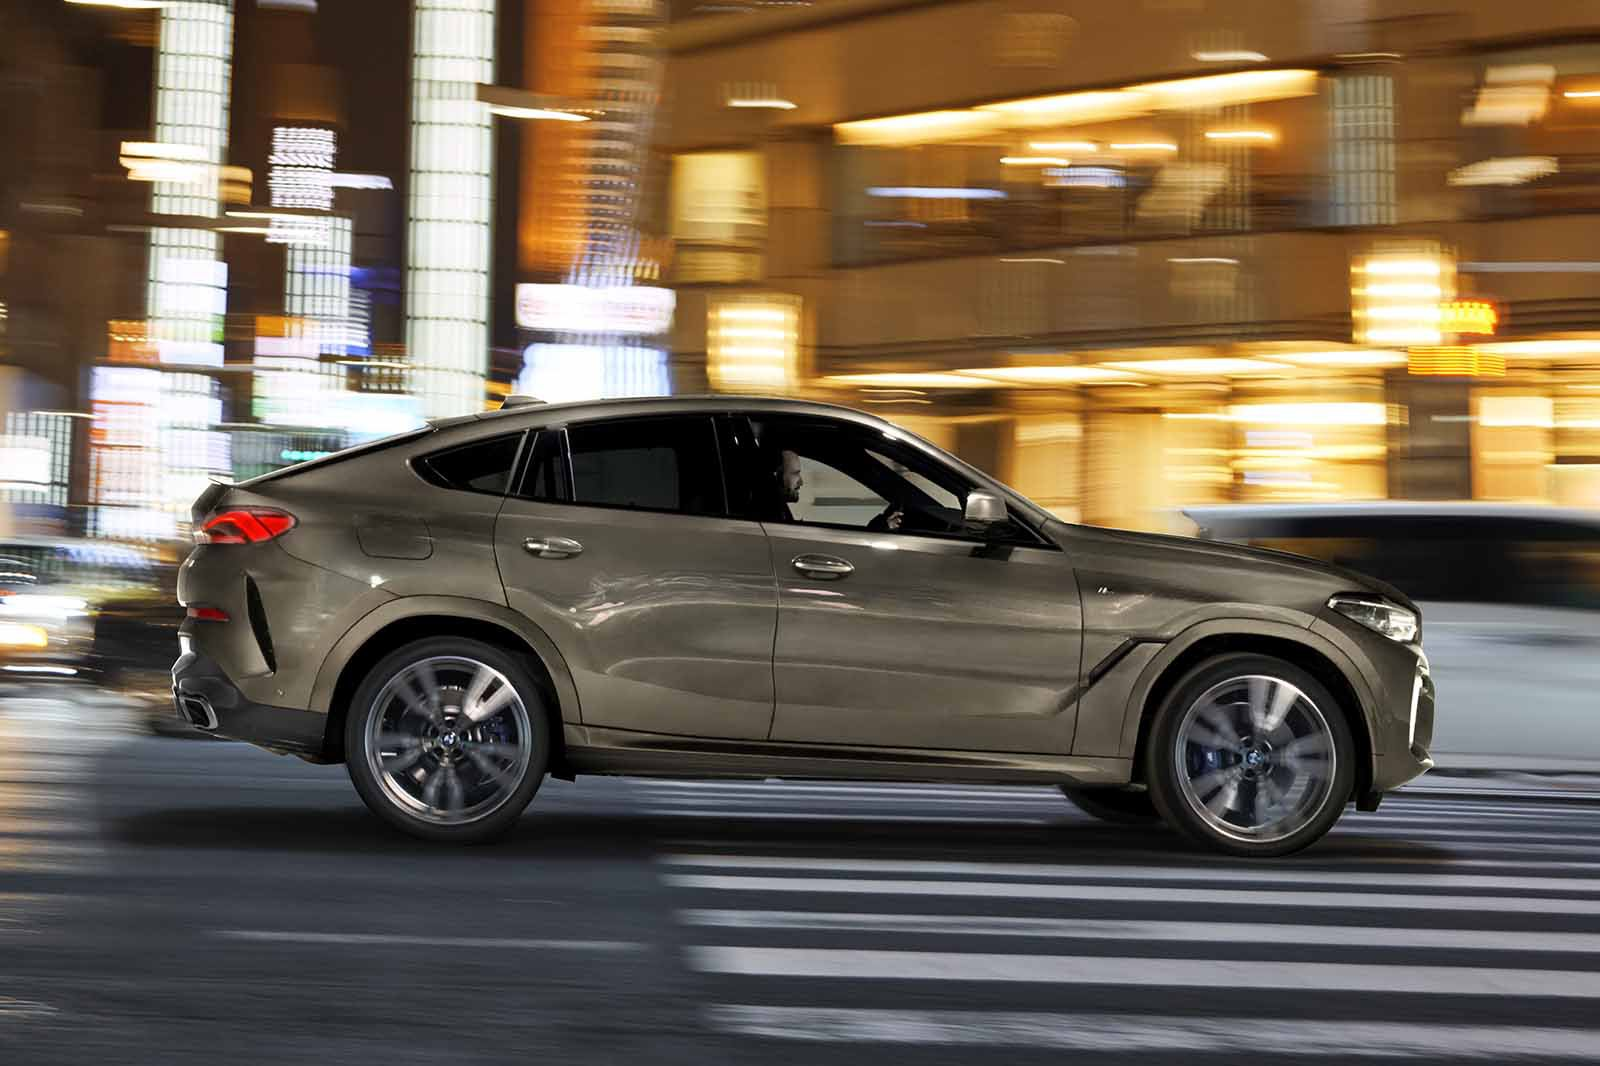 BMW X6 2019 LHD panning